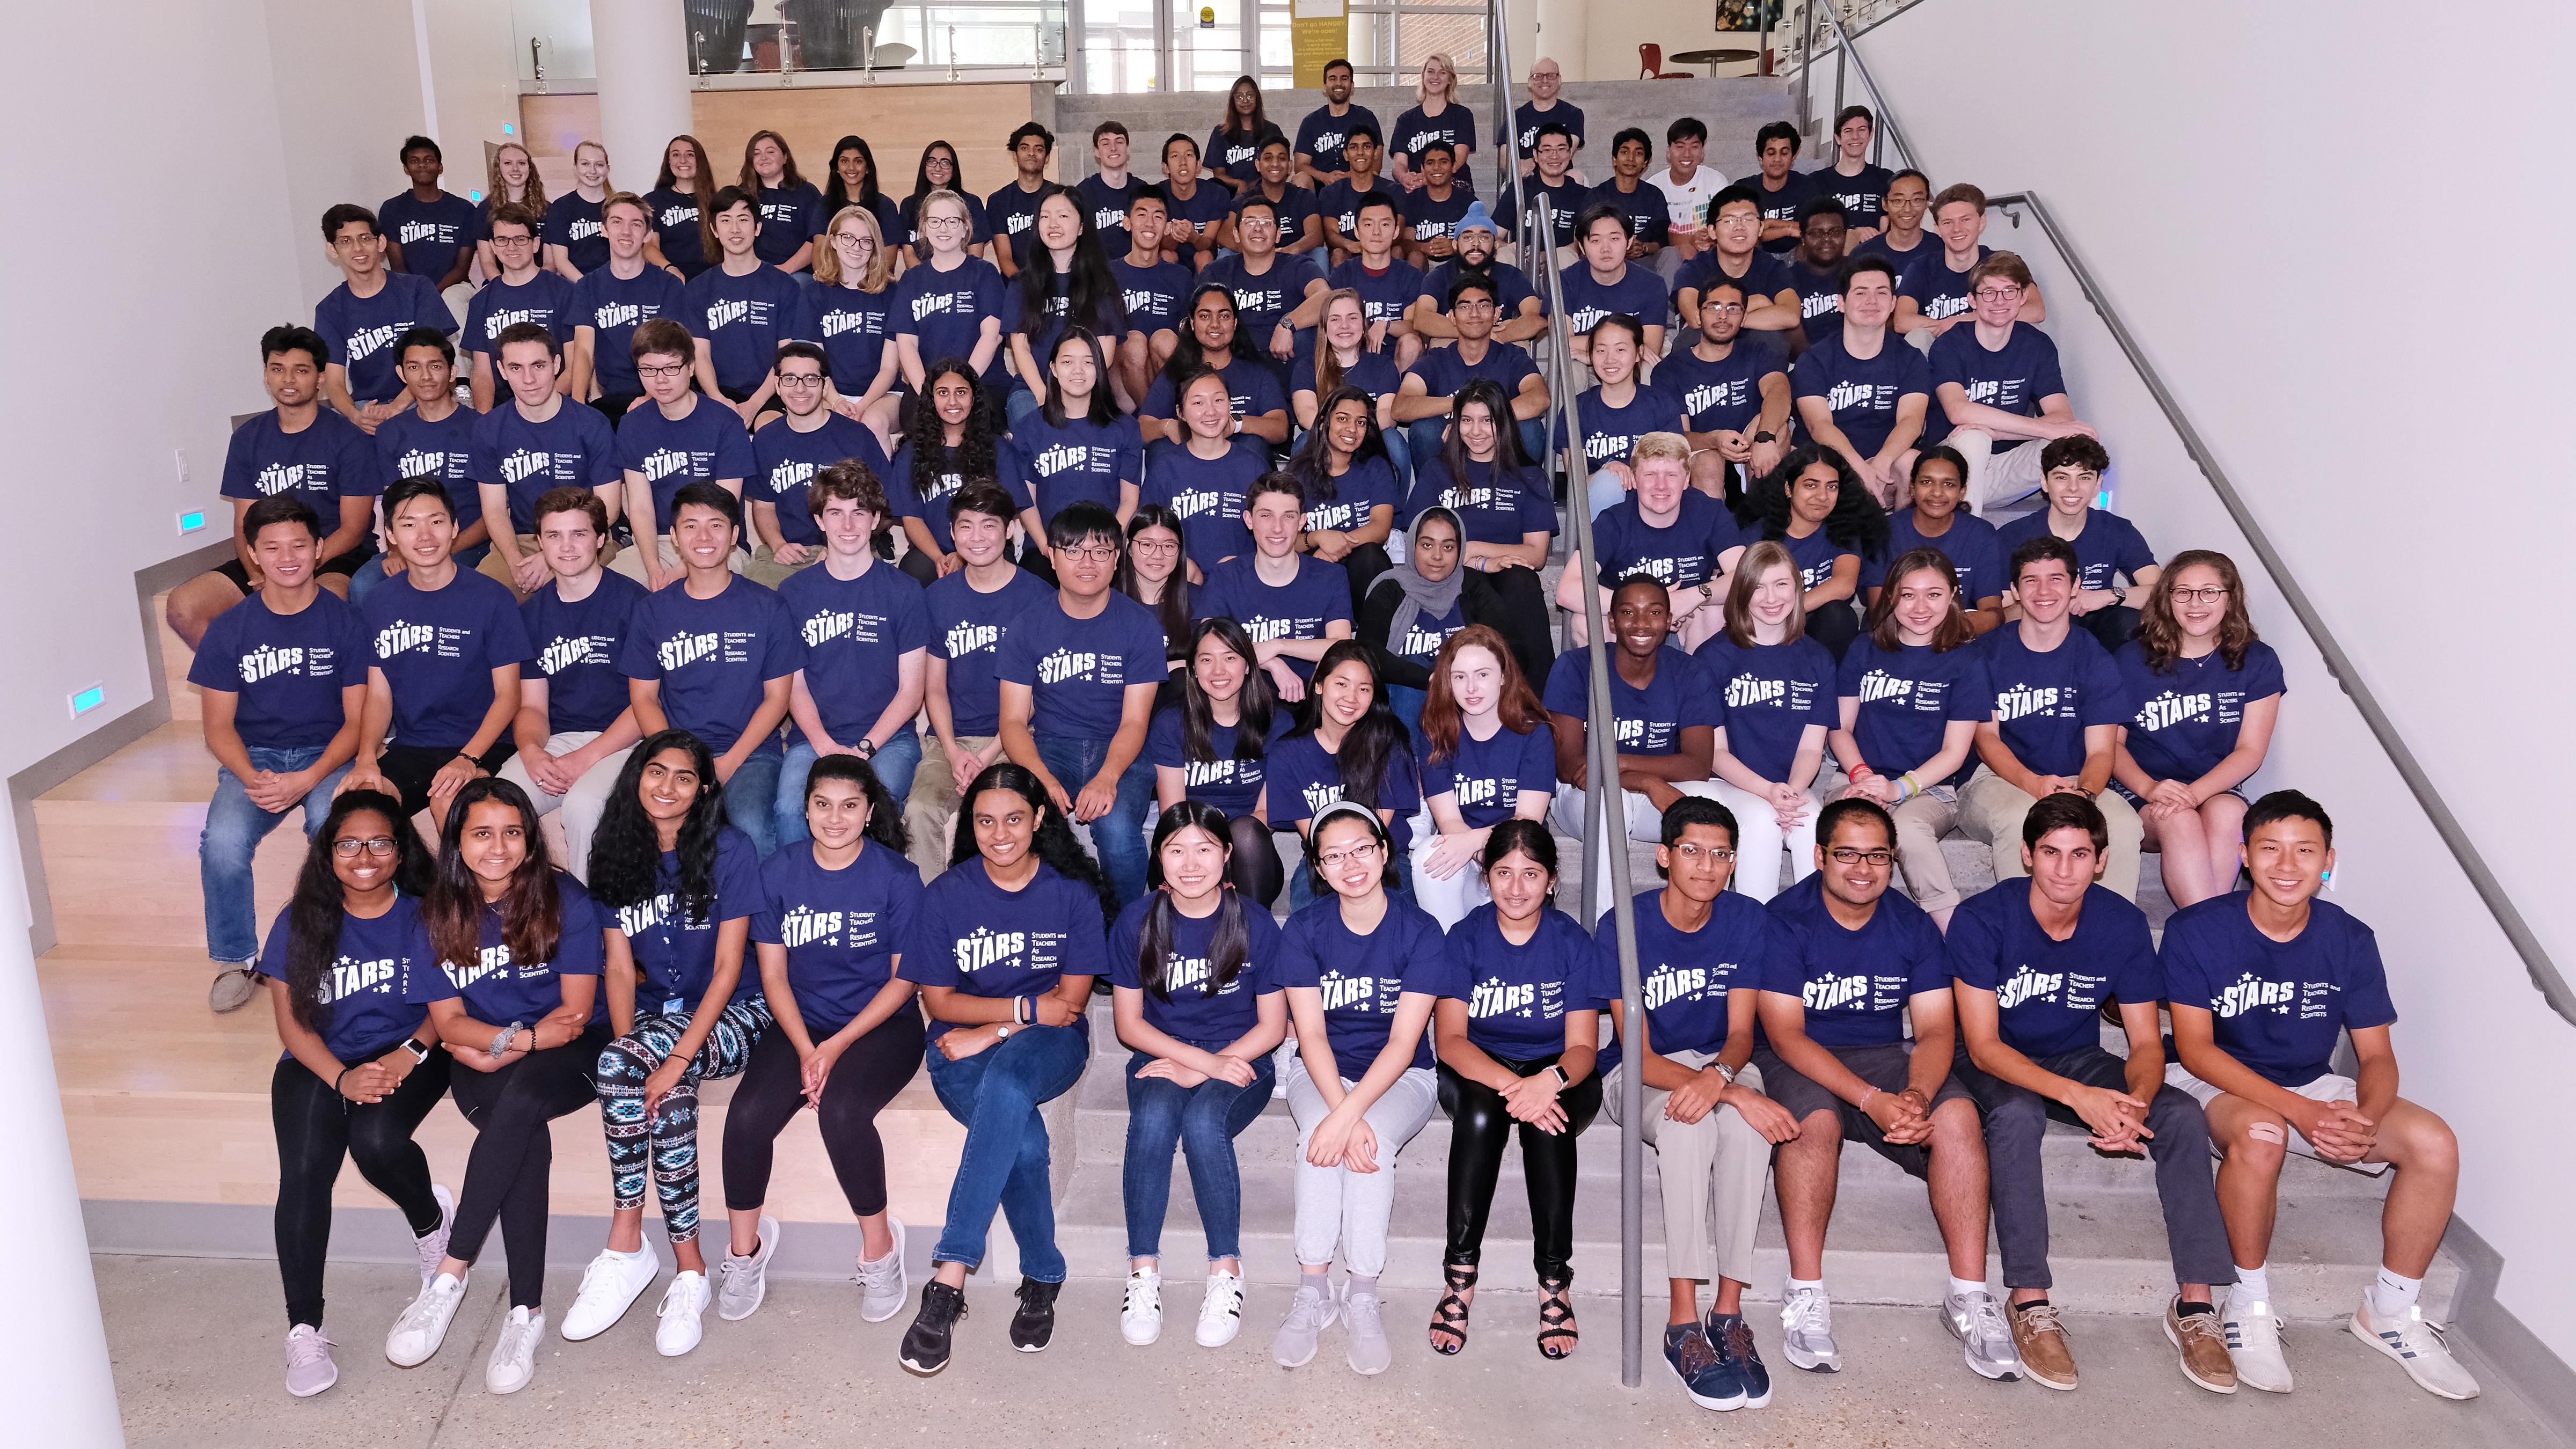 2019 STARS students